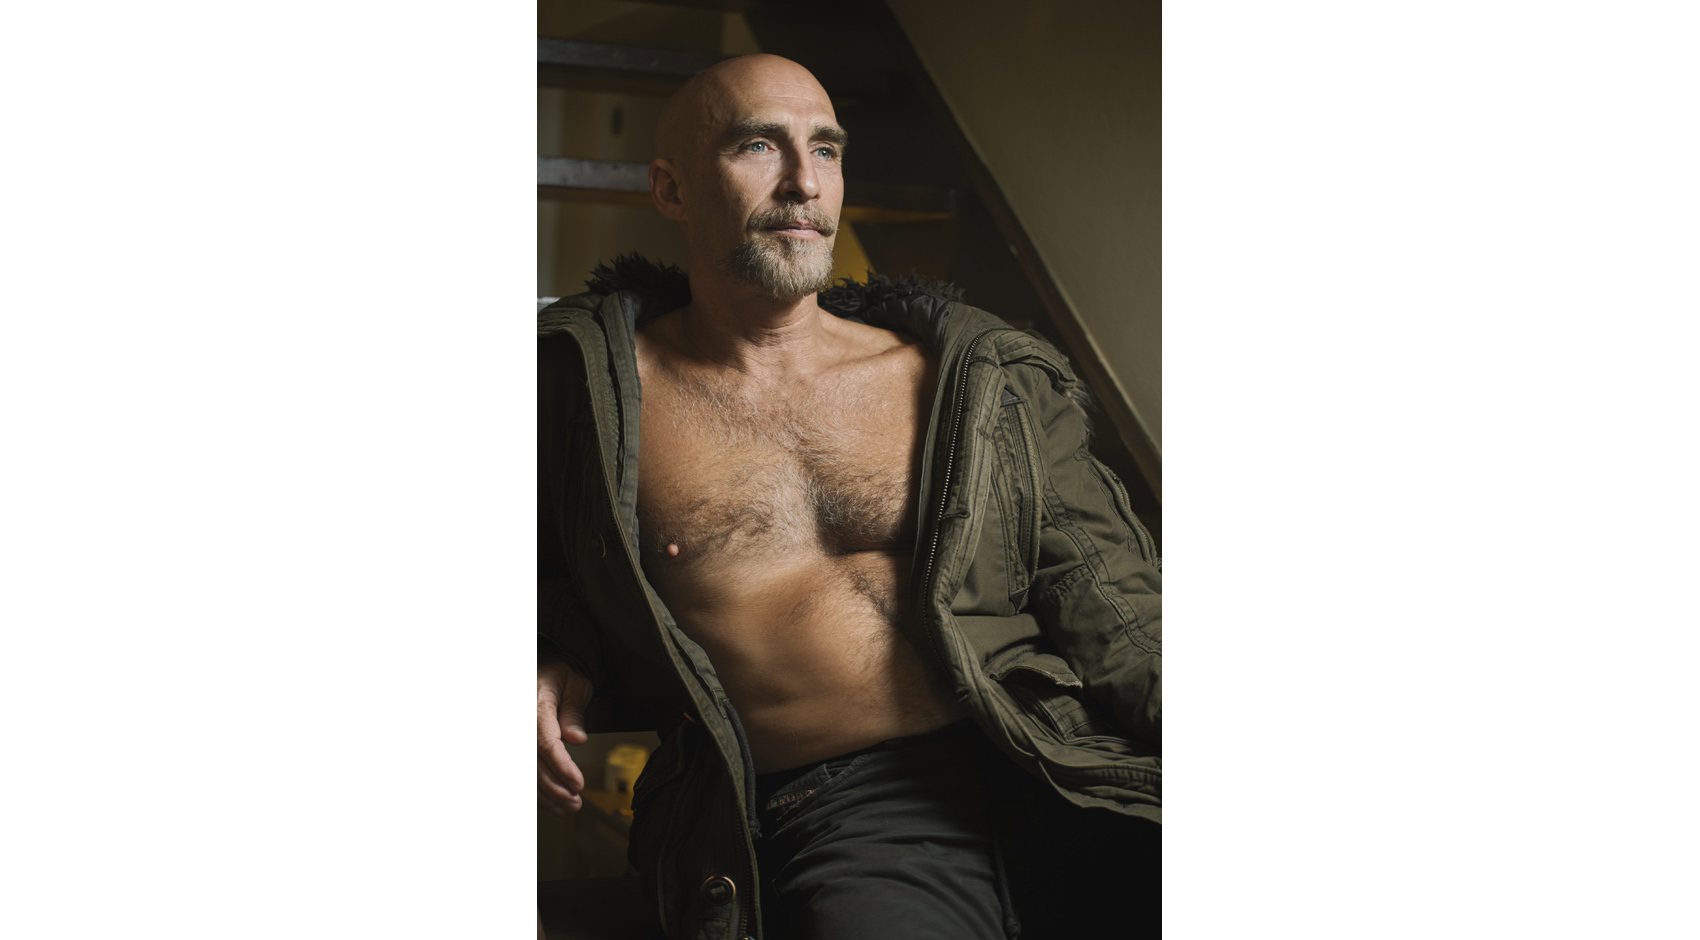 Men Over 50 - David